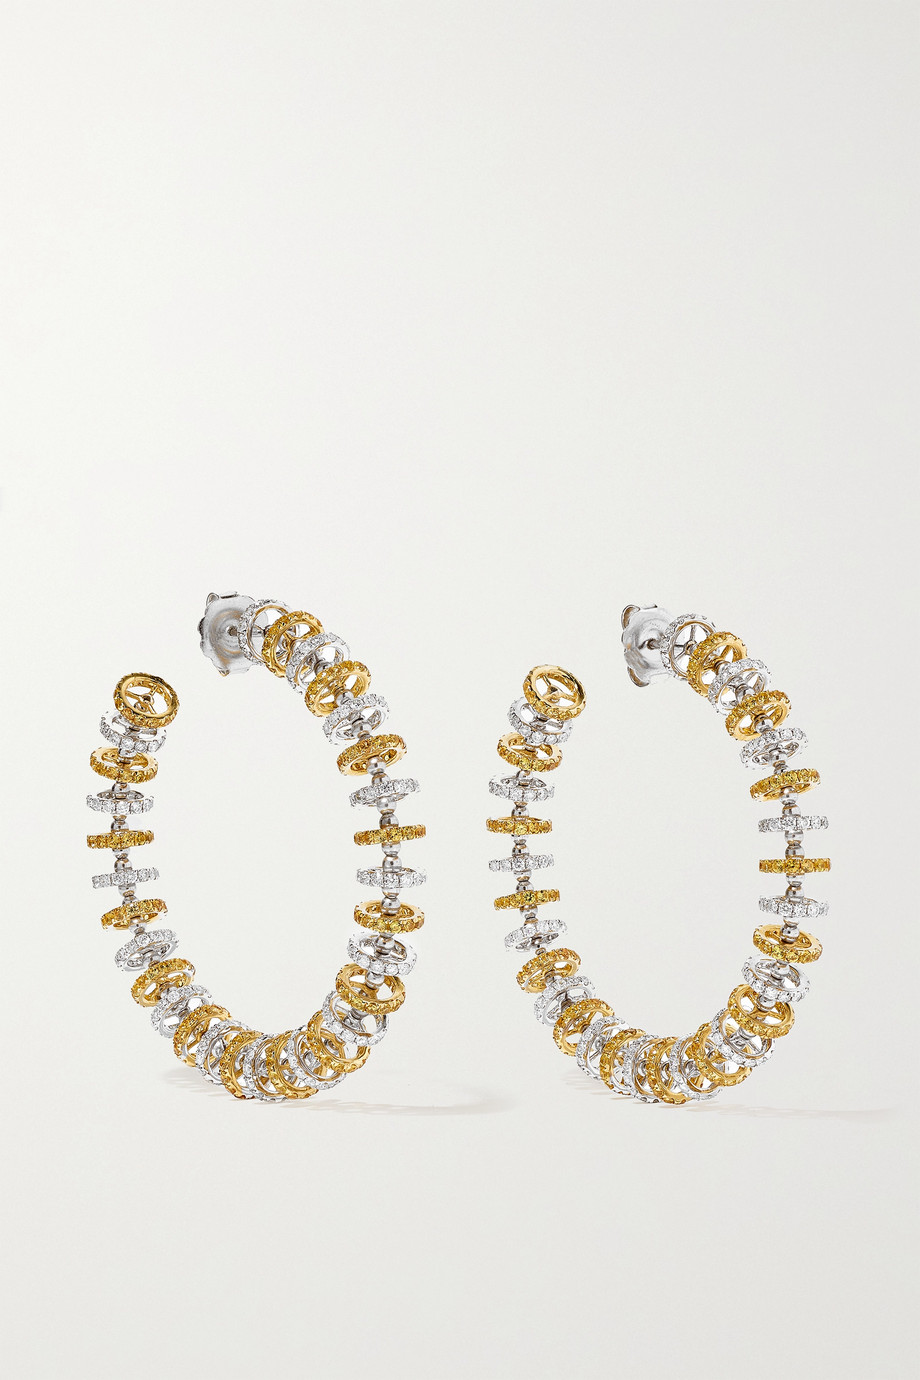 OFIRA Halo 18-karat white and yellow gold, sapphire and diamond hoop earrings